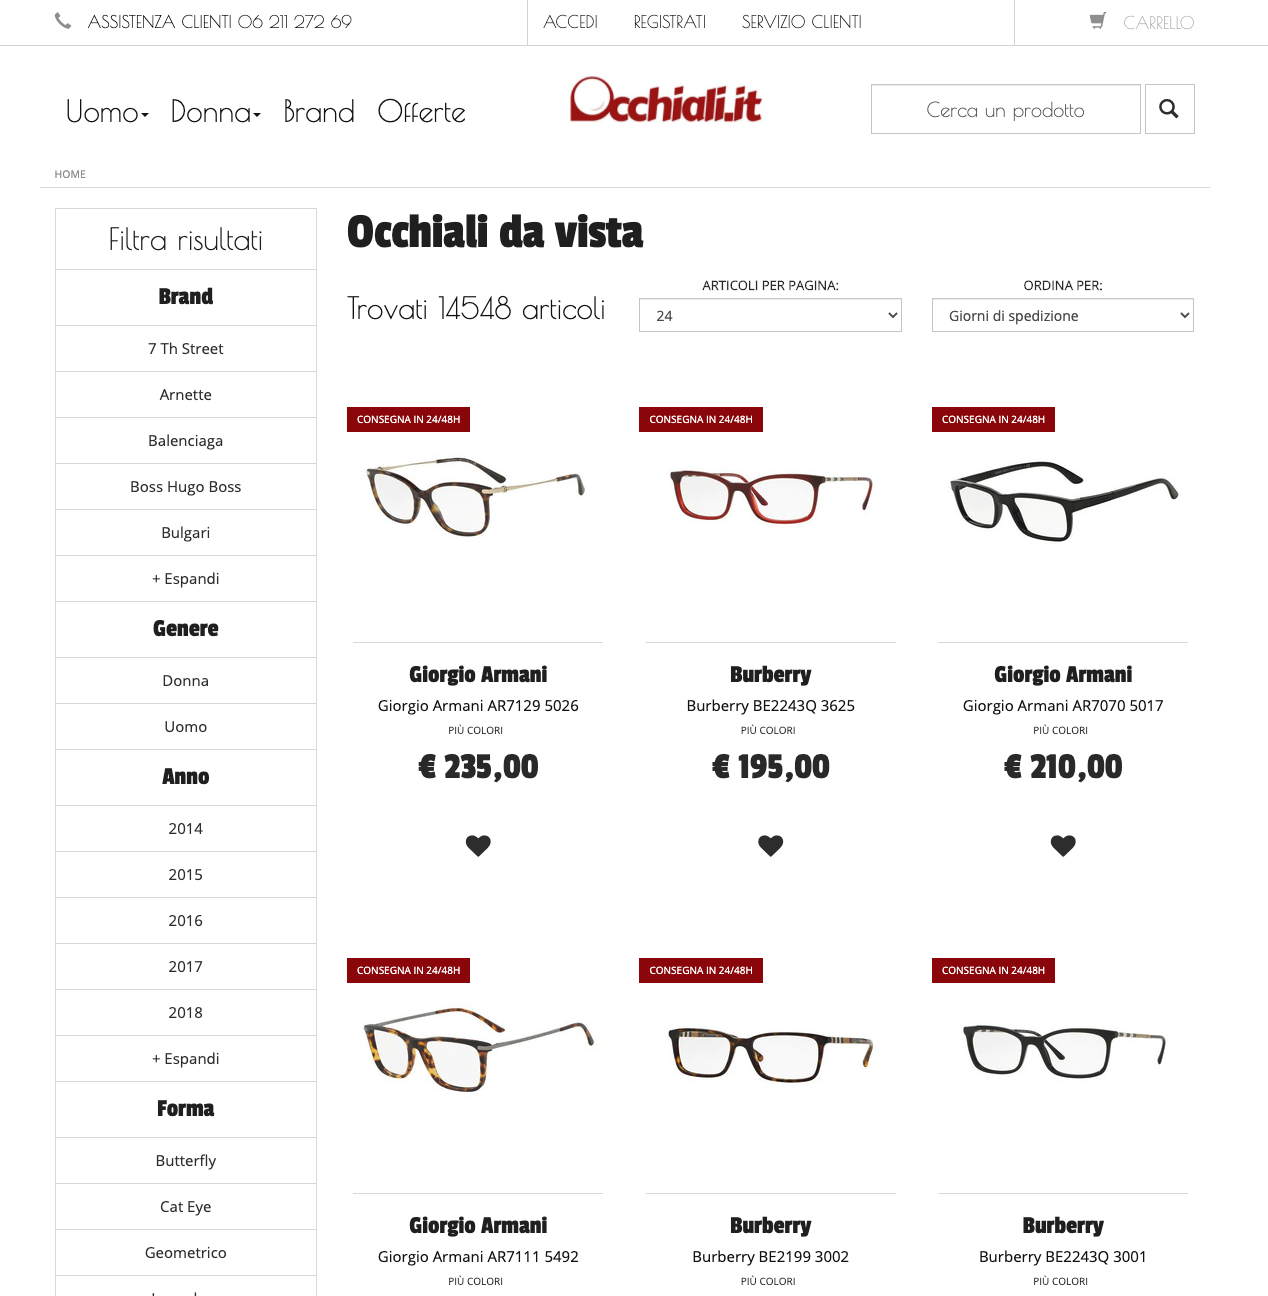 Occhiali.it occhiali da vista online